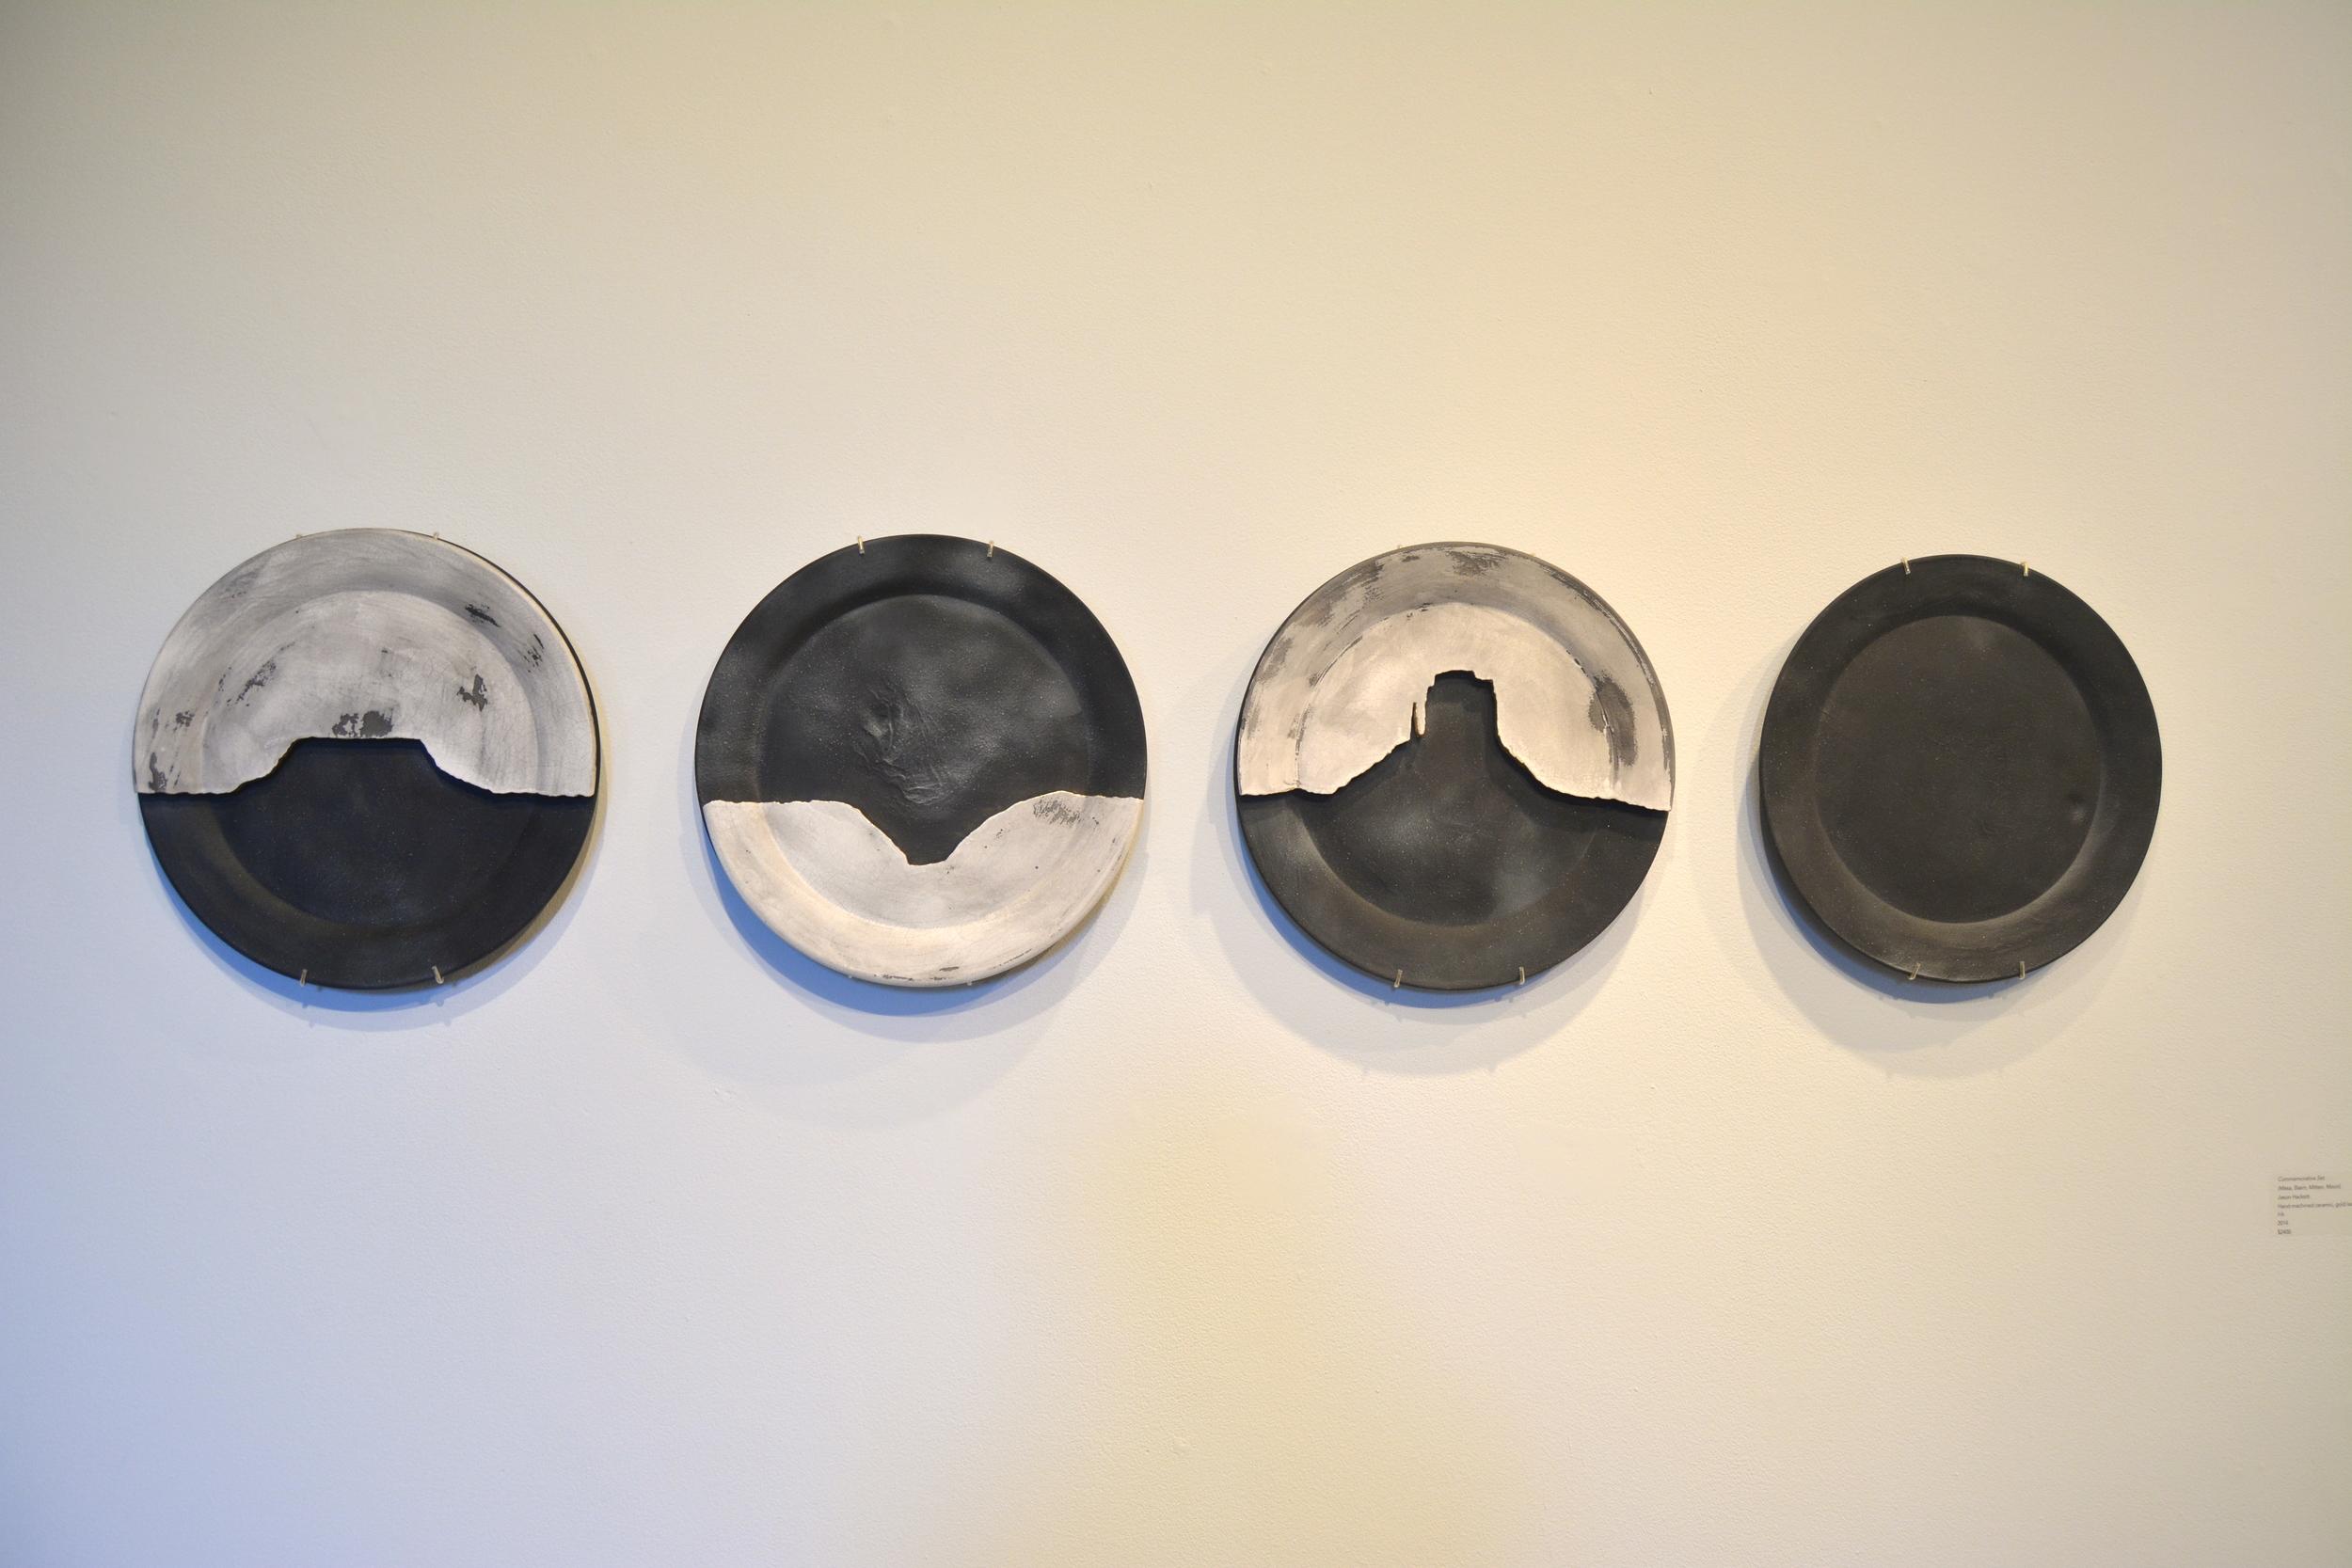 Commemorative Set (Mesa, Basin, Mitten, Moon) by Jason Hackett